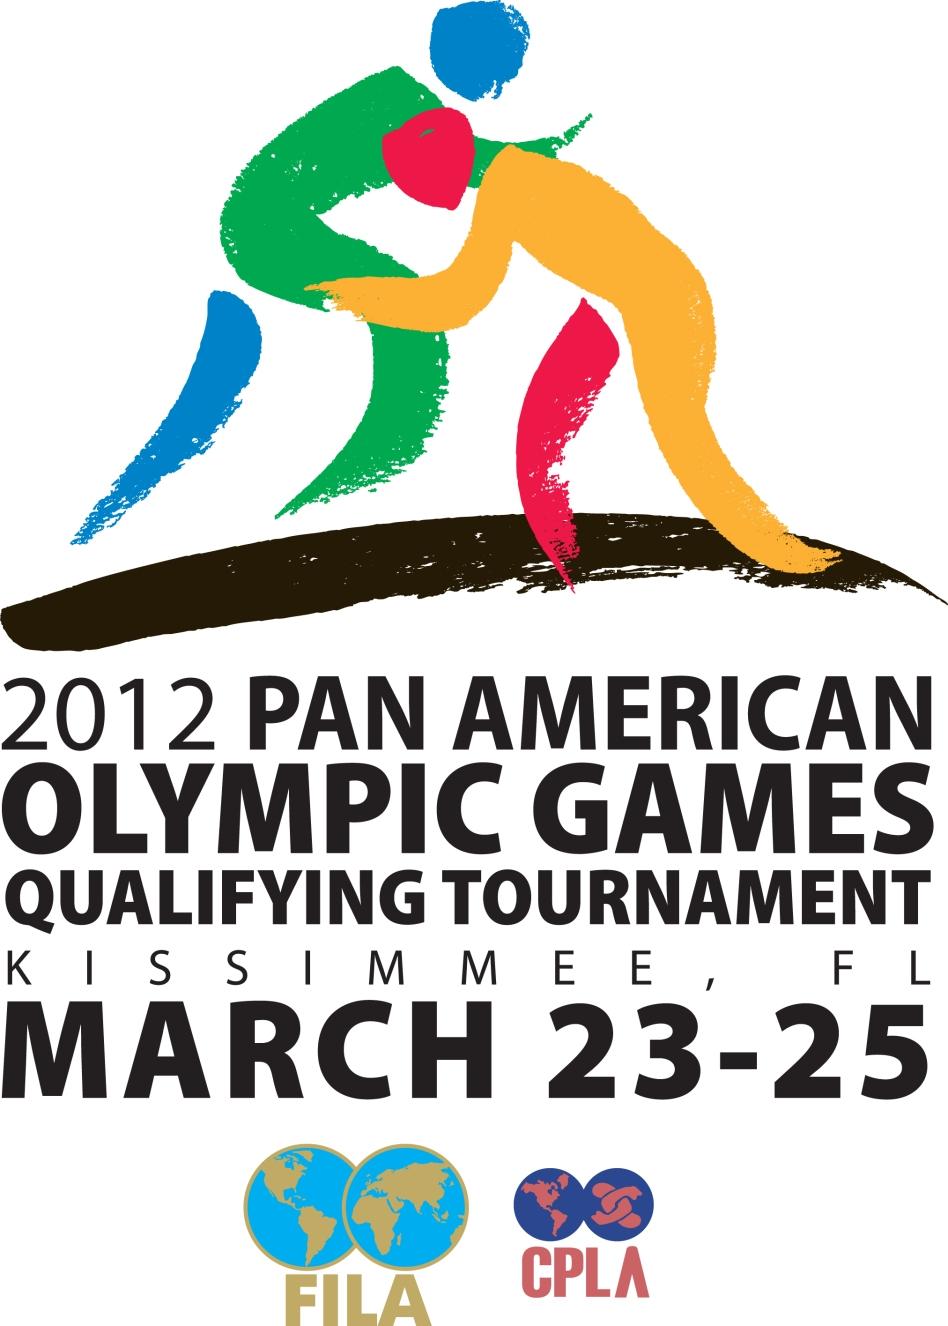 2012 Pan American Olympic Games